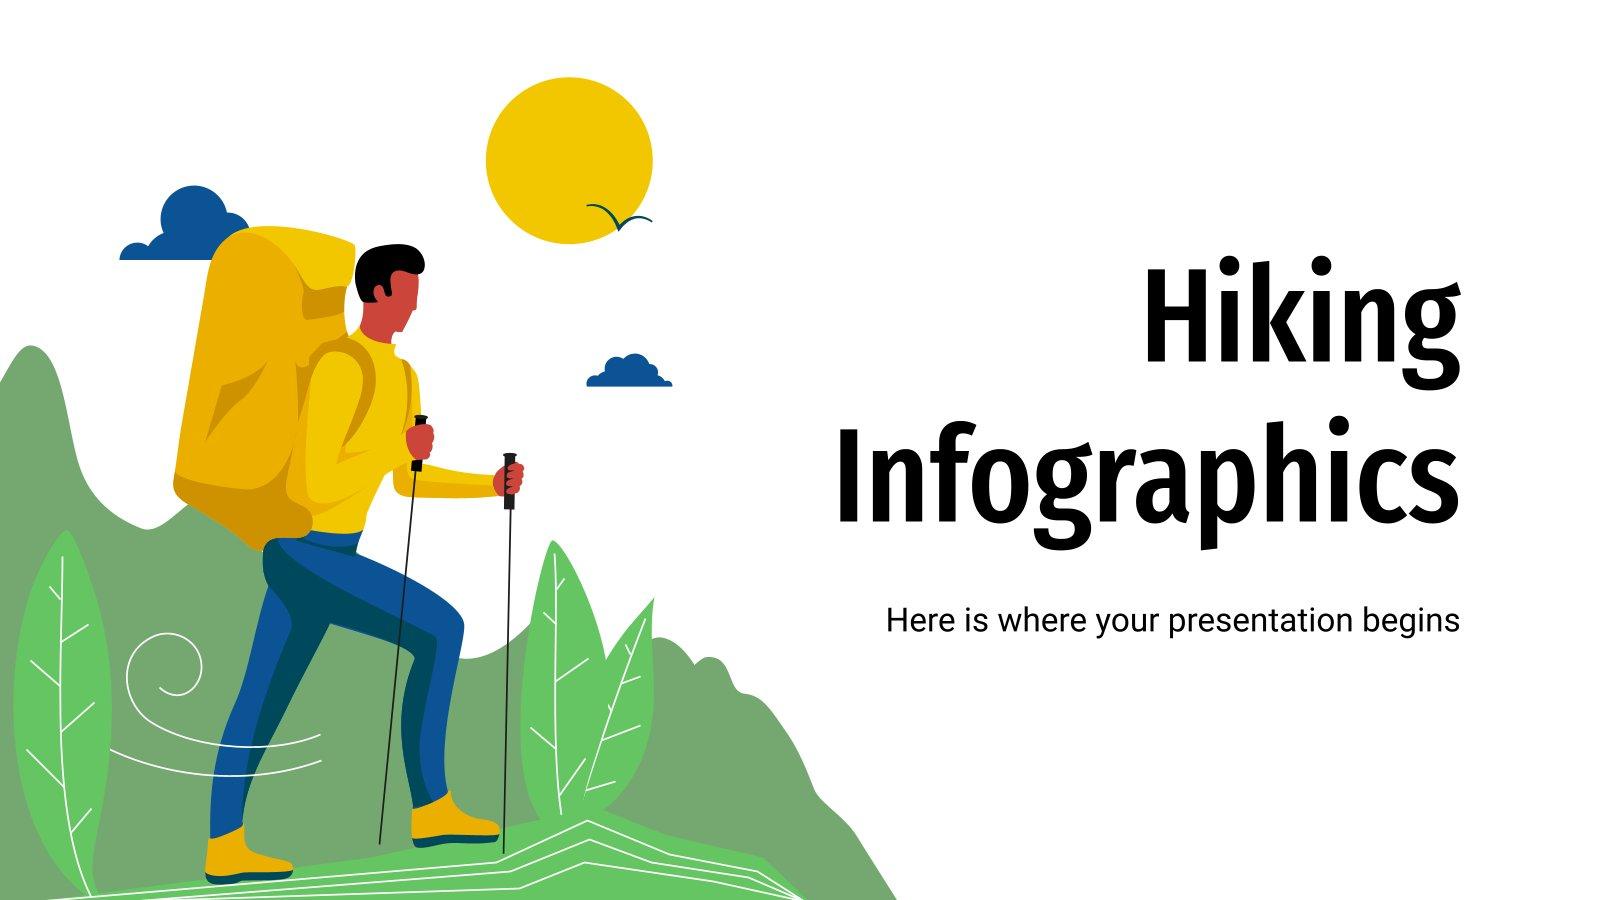 Hiking Infographics presentation template